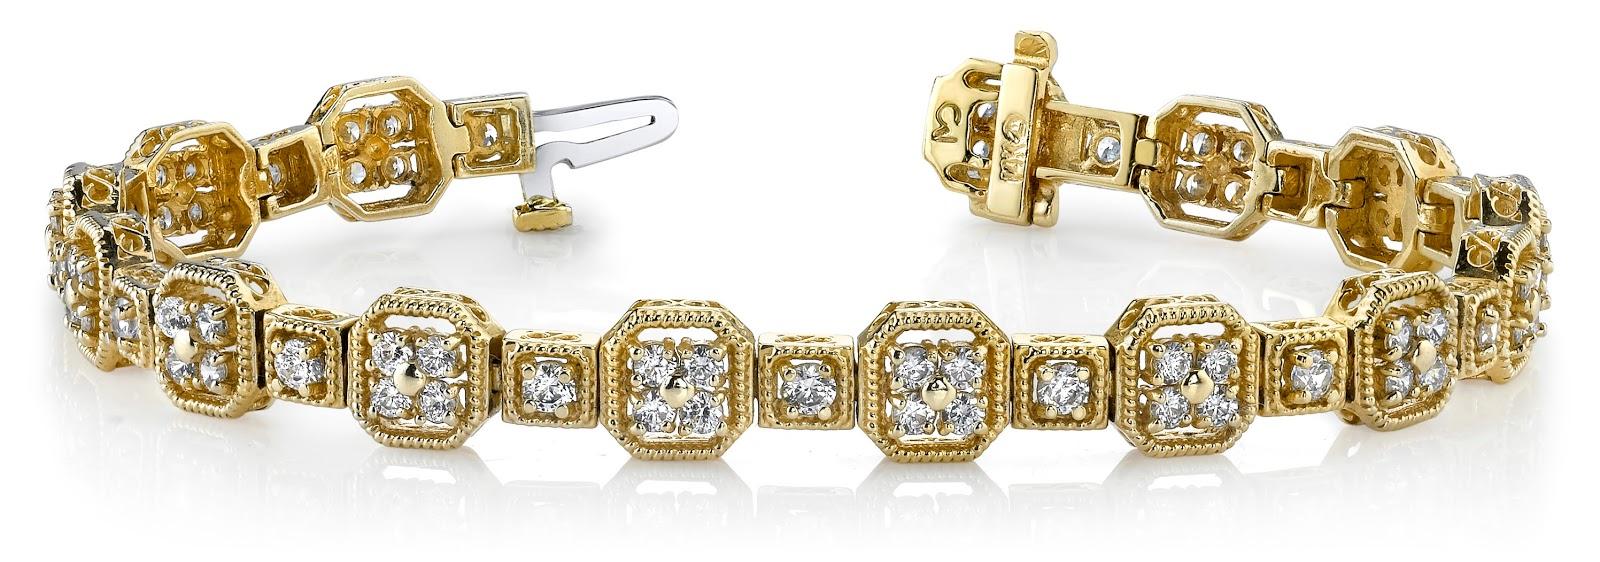 Vintage Quad Square Diamond Bracelet from Anjolee Jewelry